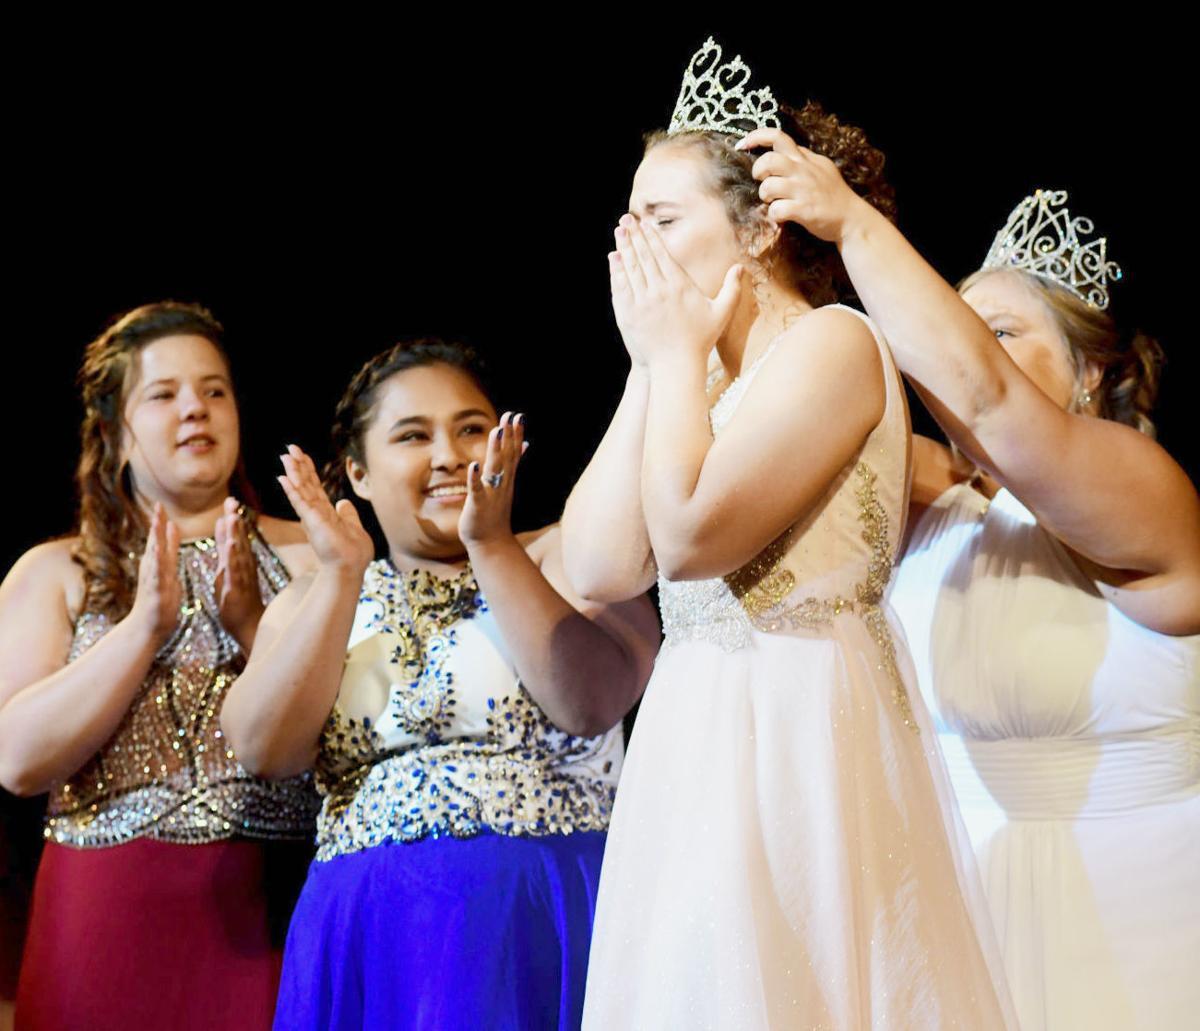 Cecelia Toenjes crowned Miss Litchfield 2019